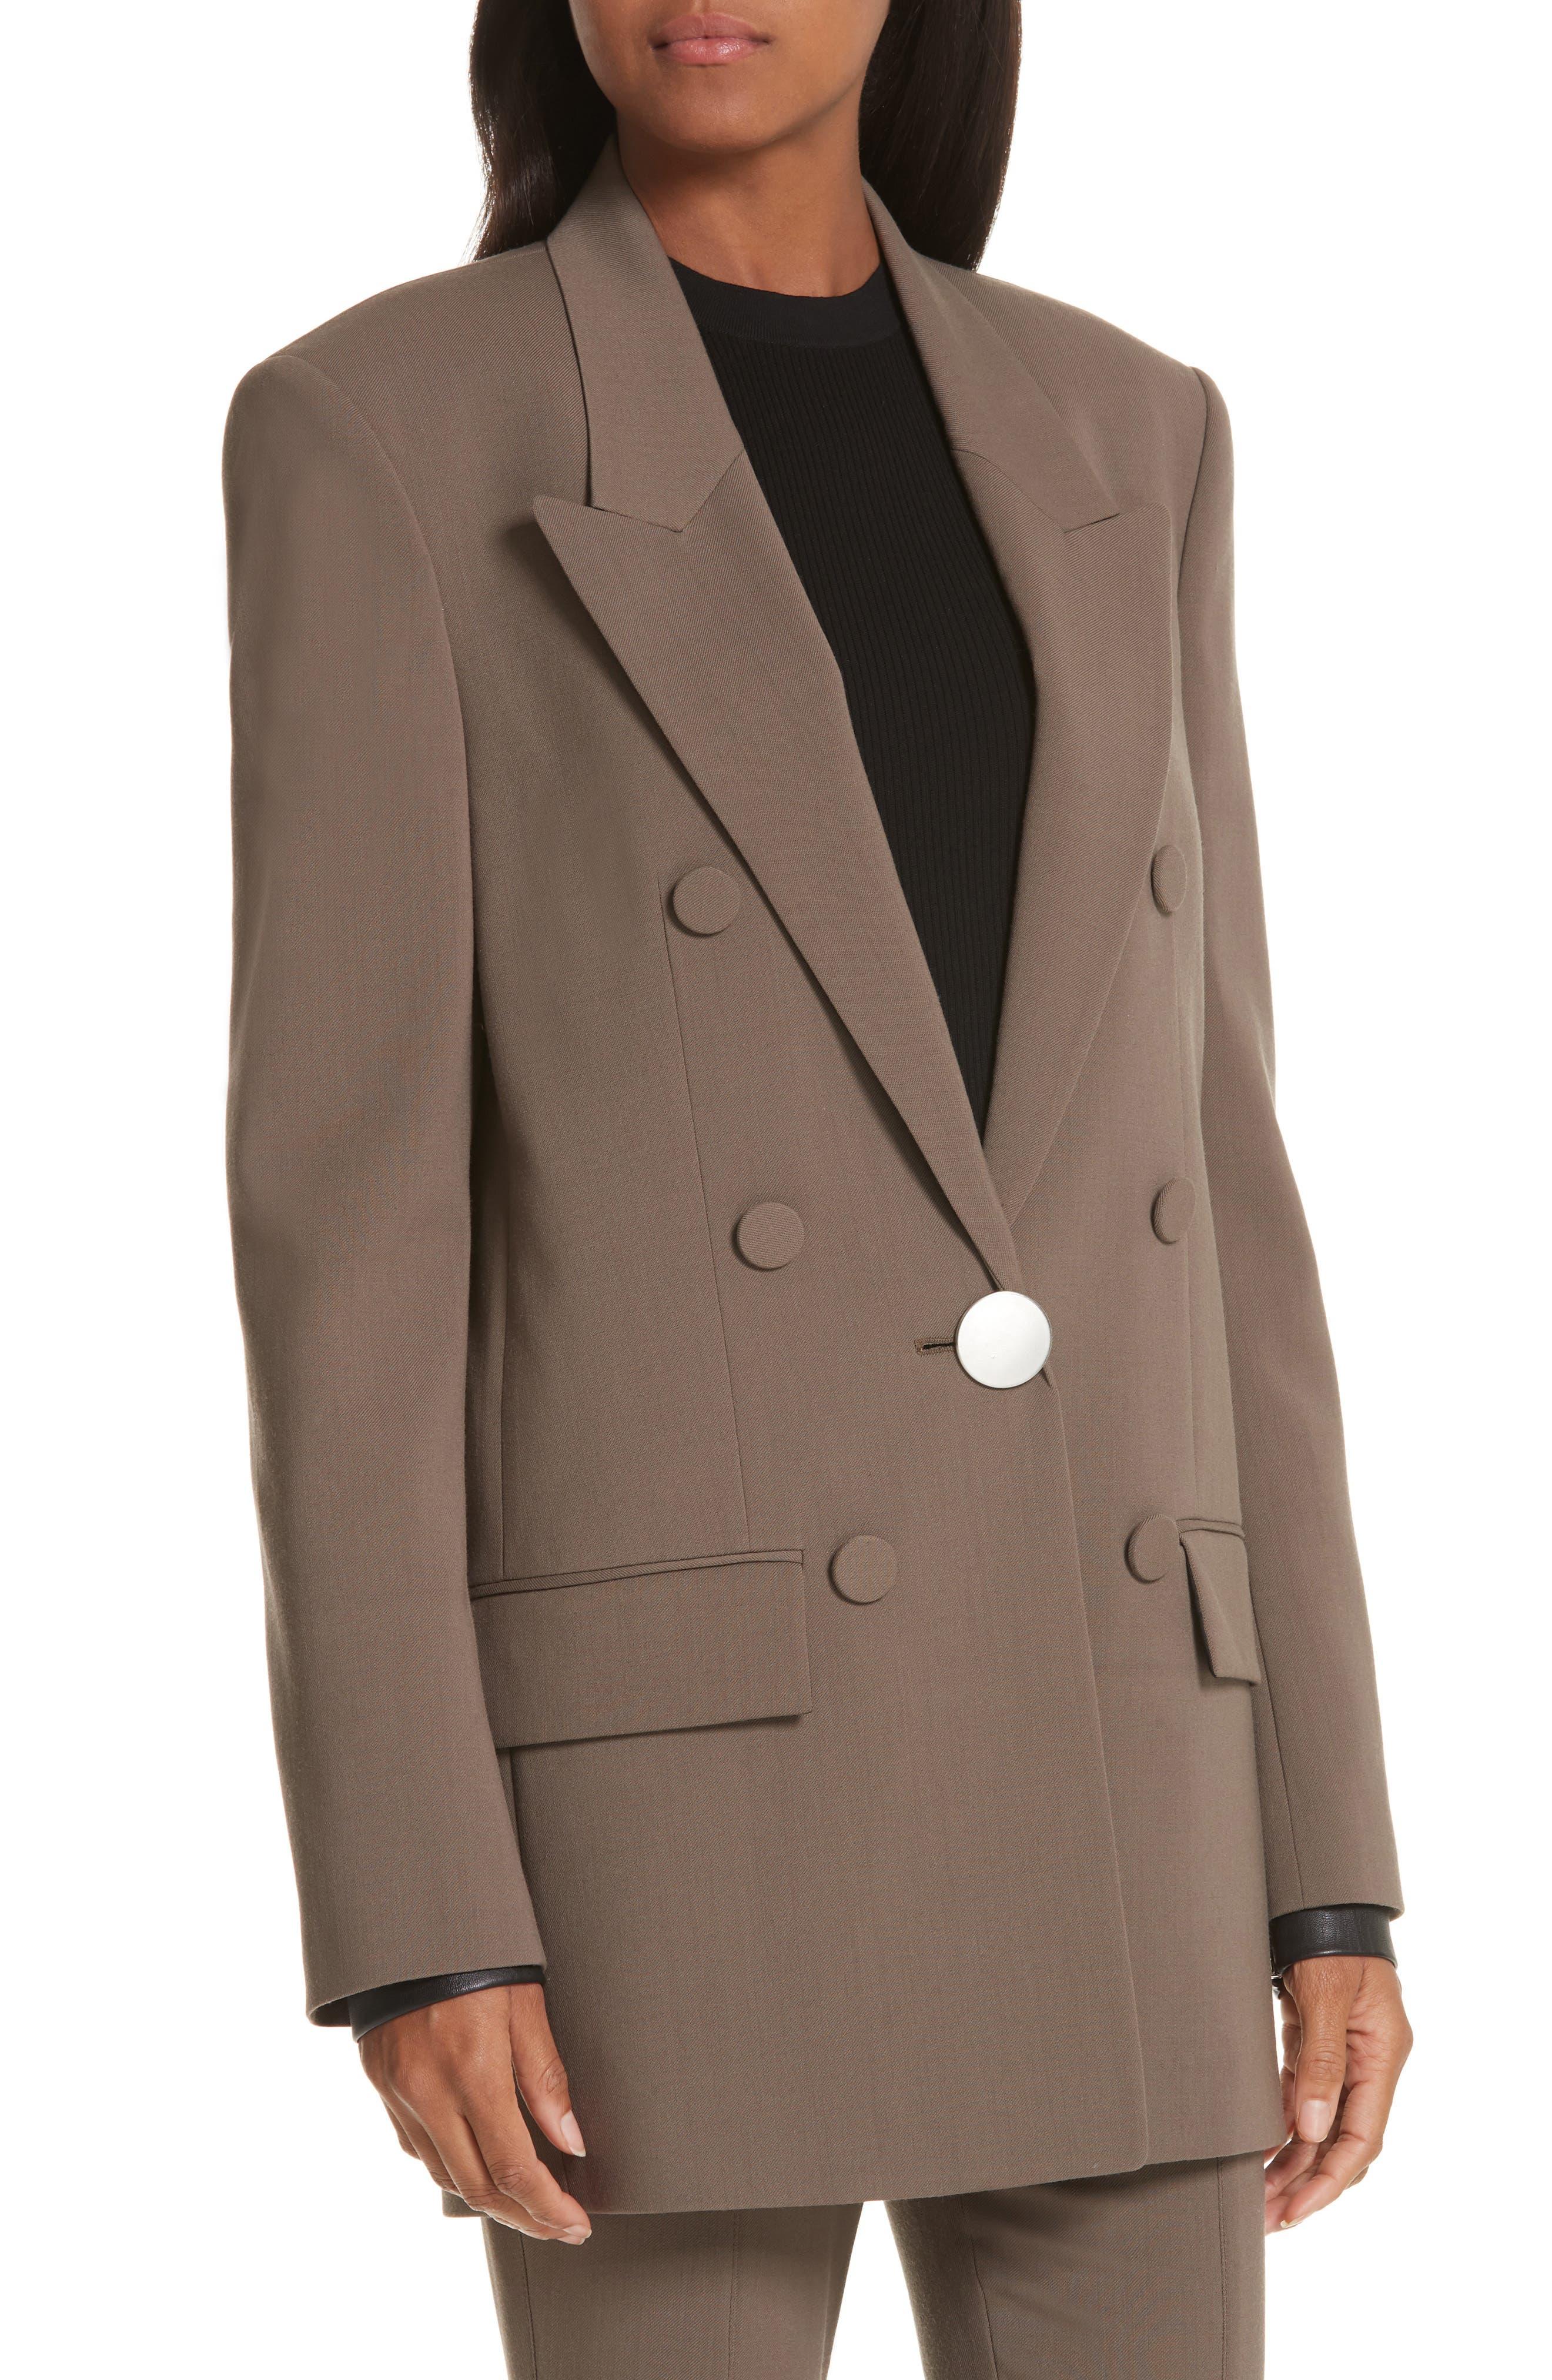 ALEXANDER WANG,                             Leather Cuff Blazer,                             Alternate thumbnail 5, color,                             KHAKI GREEN